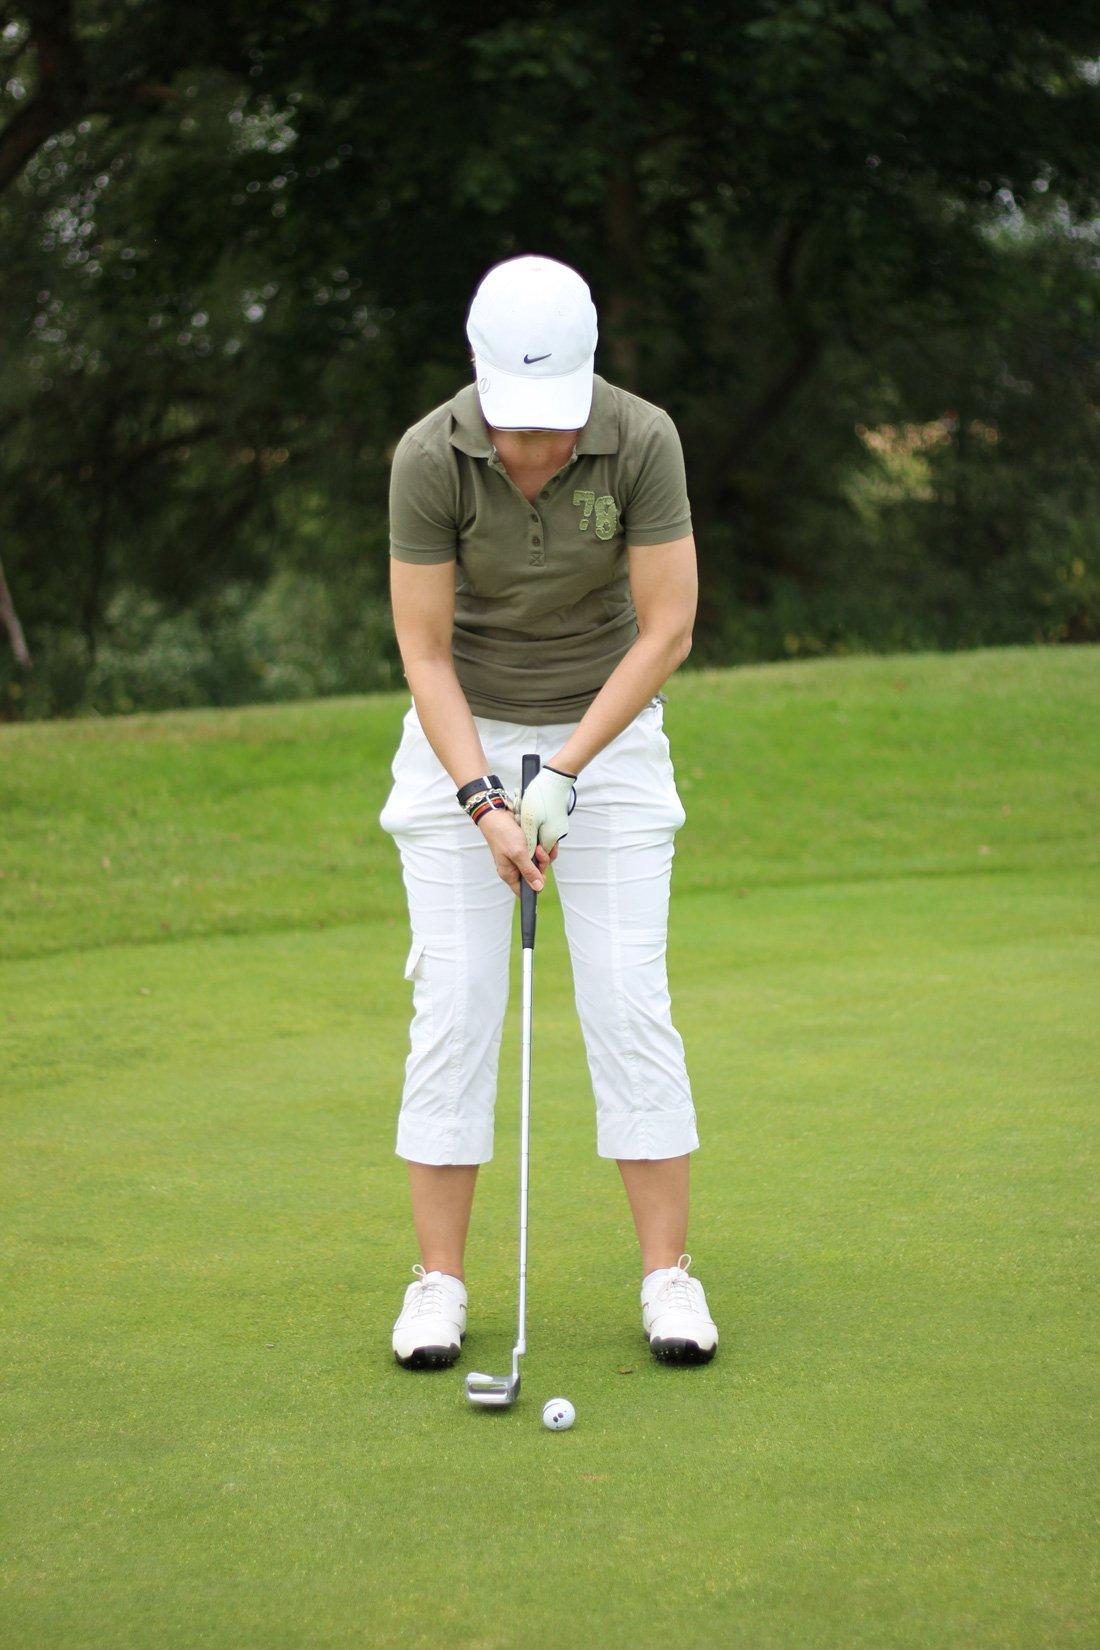 Golfclub Sagmühle, Conny Doll spielt Golf, Putten